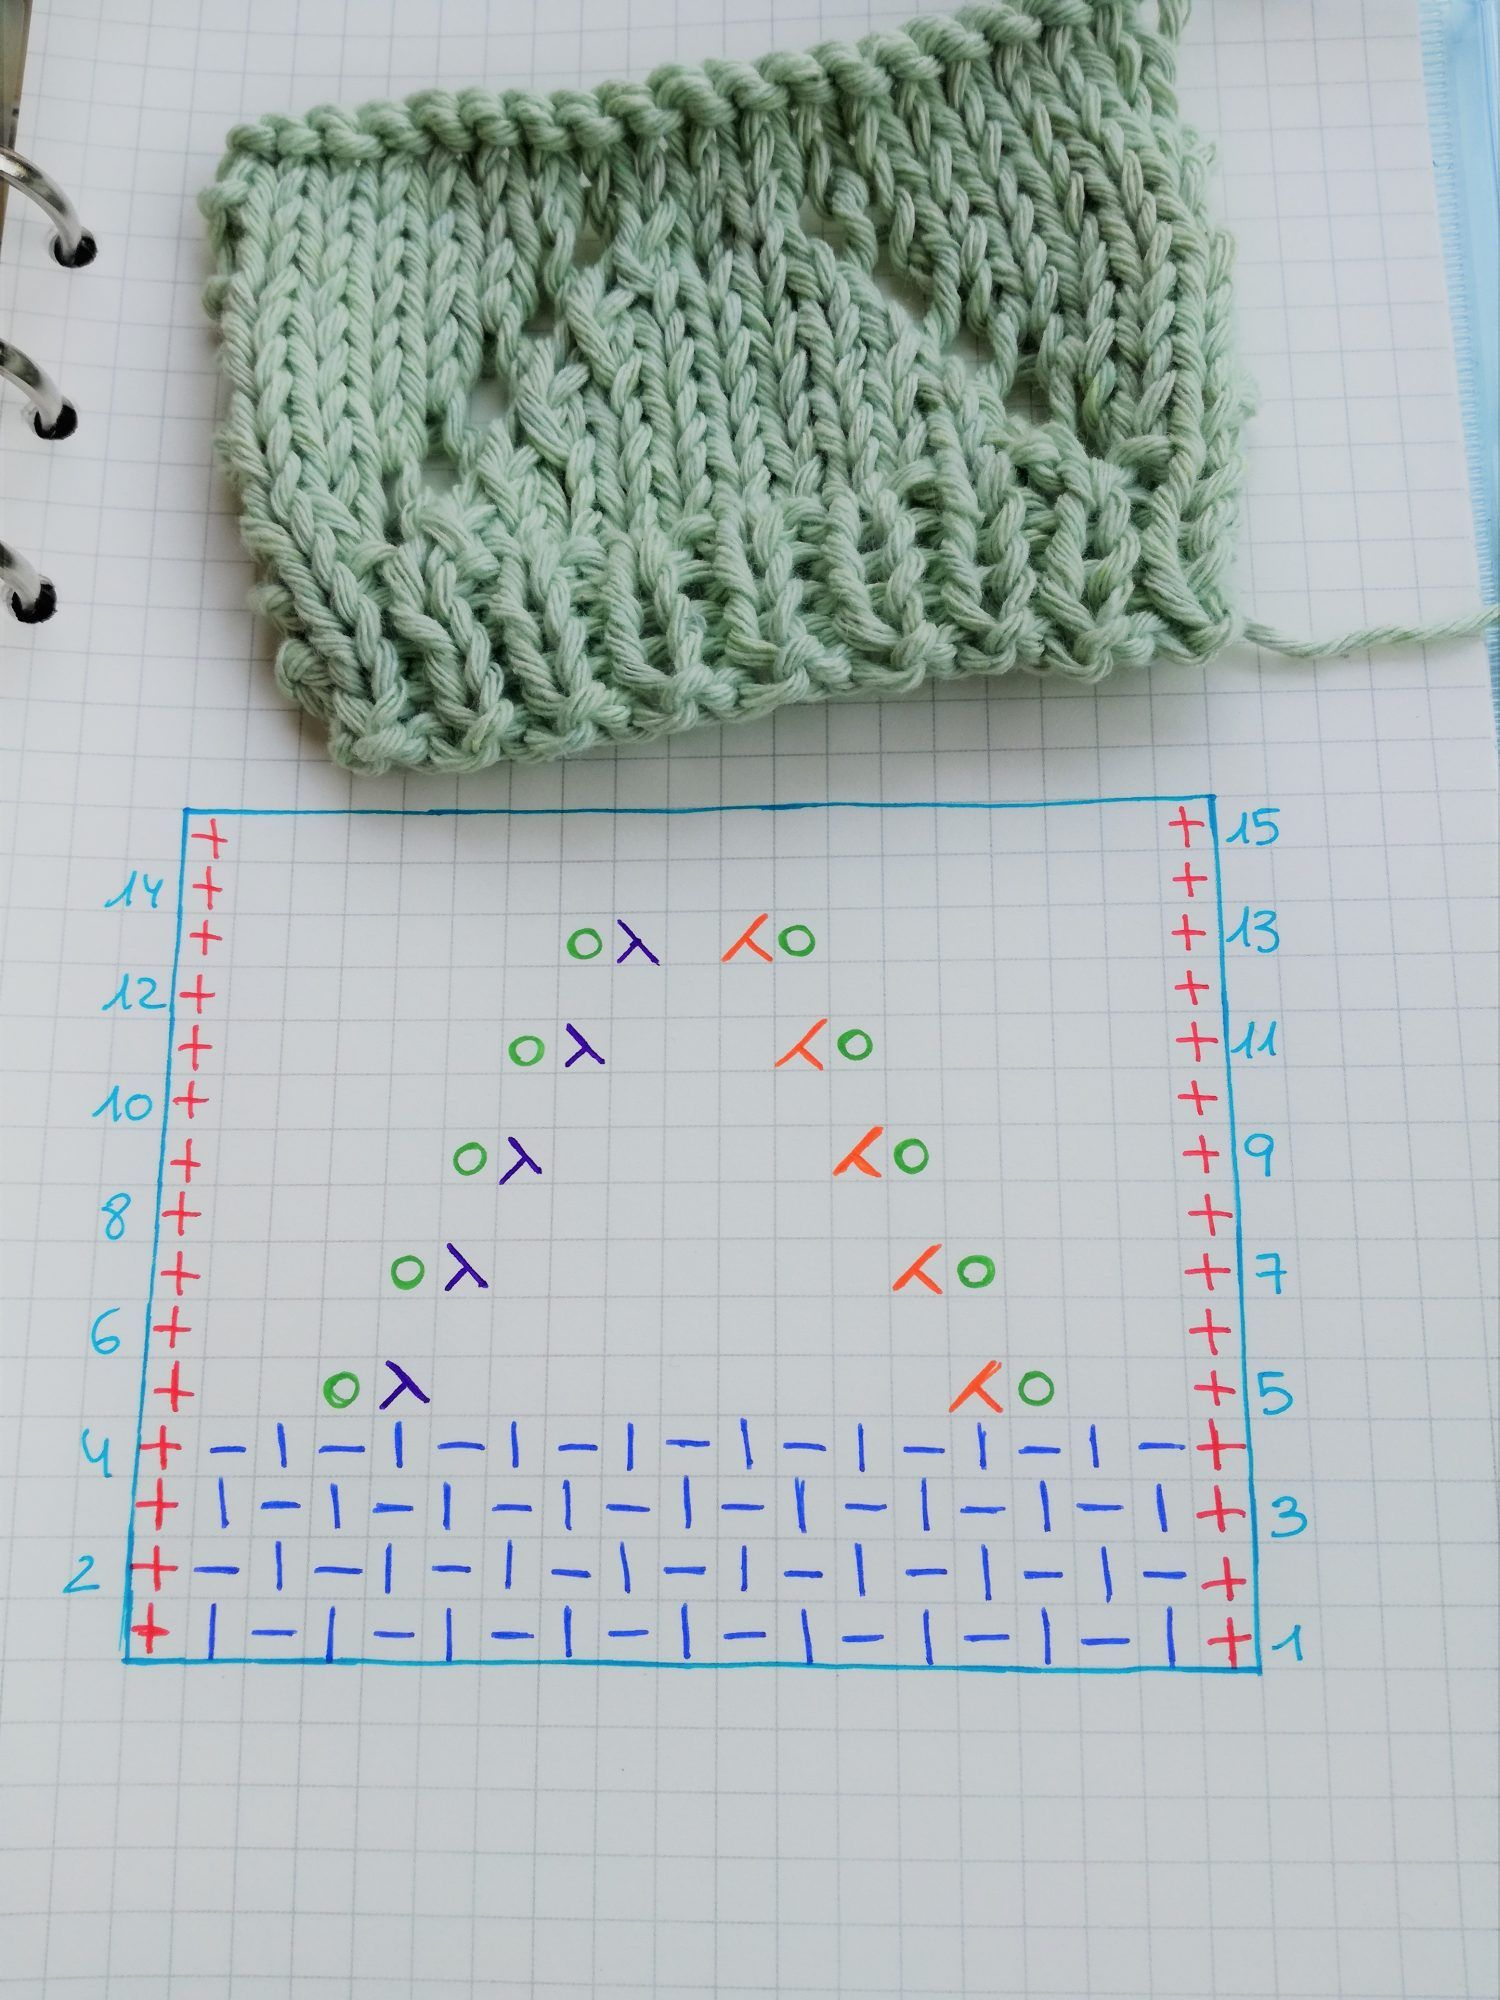 Diagramas a Tricot, aprende a leer patrones - Tata Patata | Crochet ...